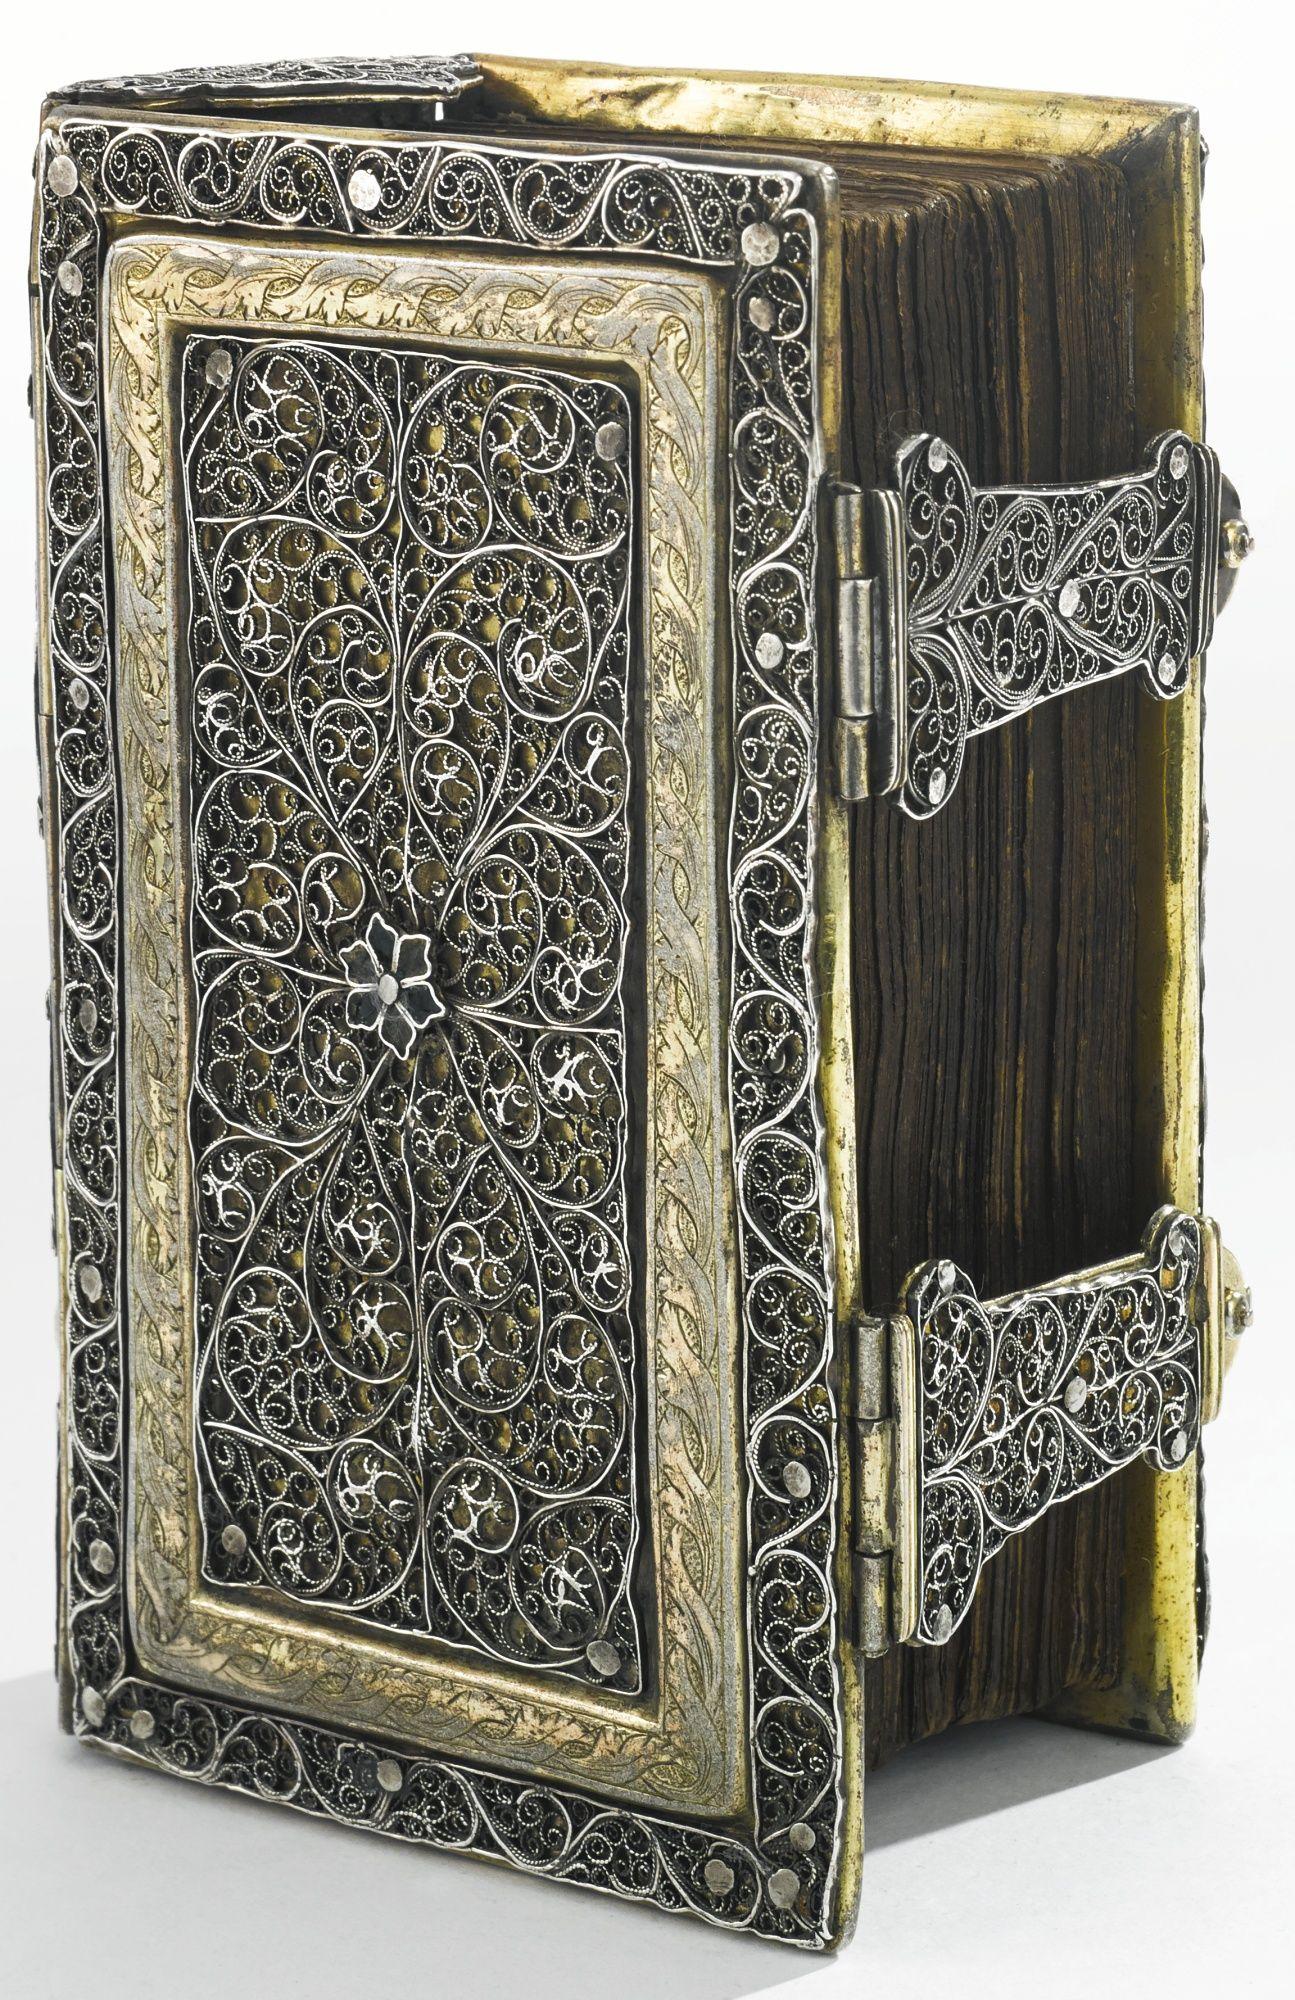 Filigree bookbinding - 18th century (German) | I love ...